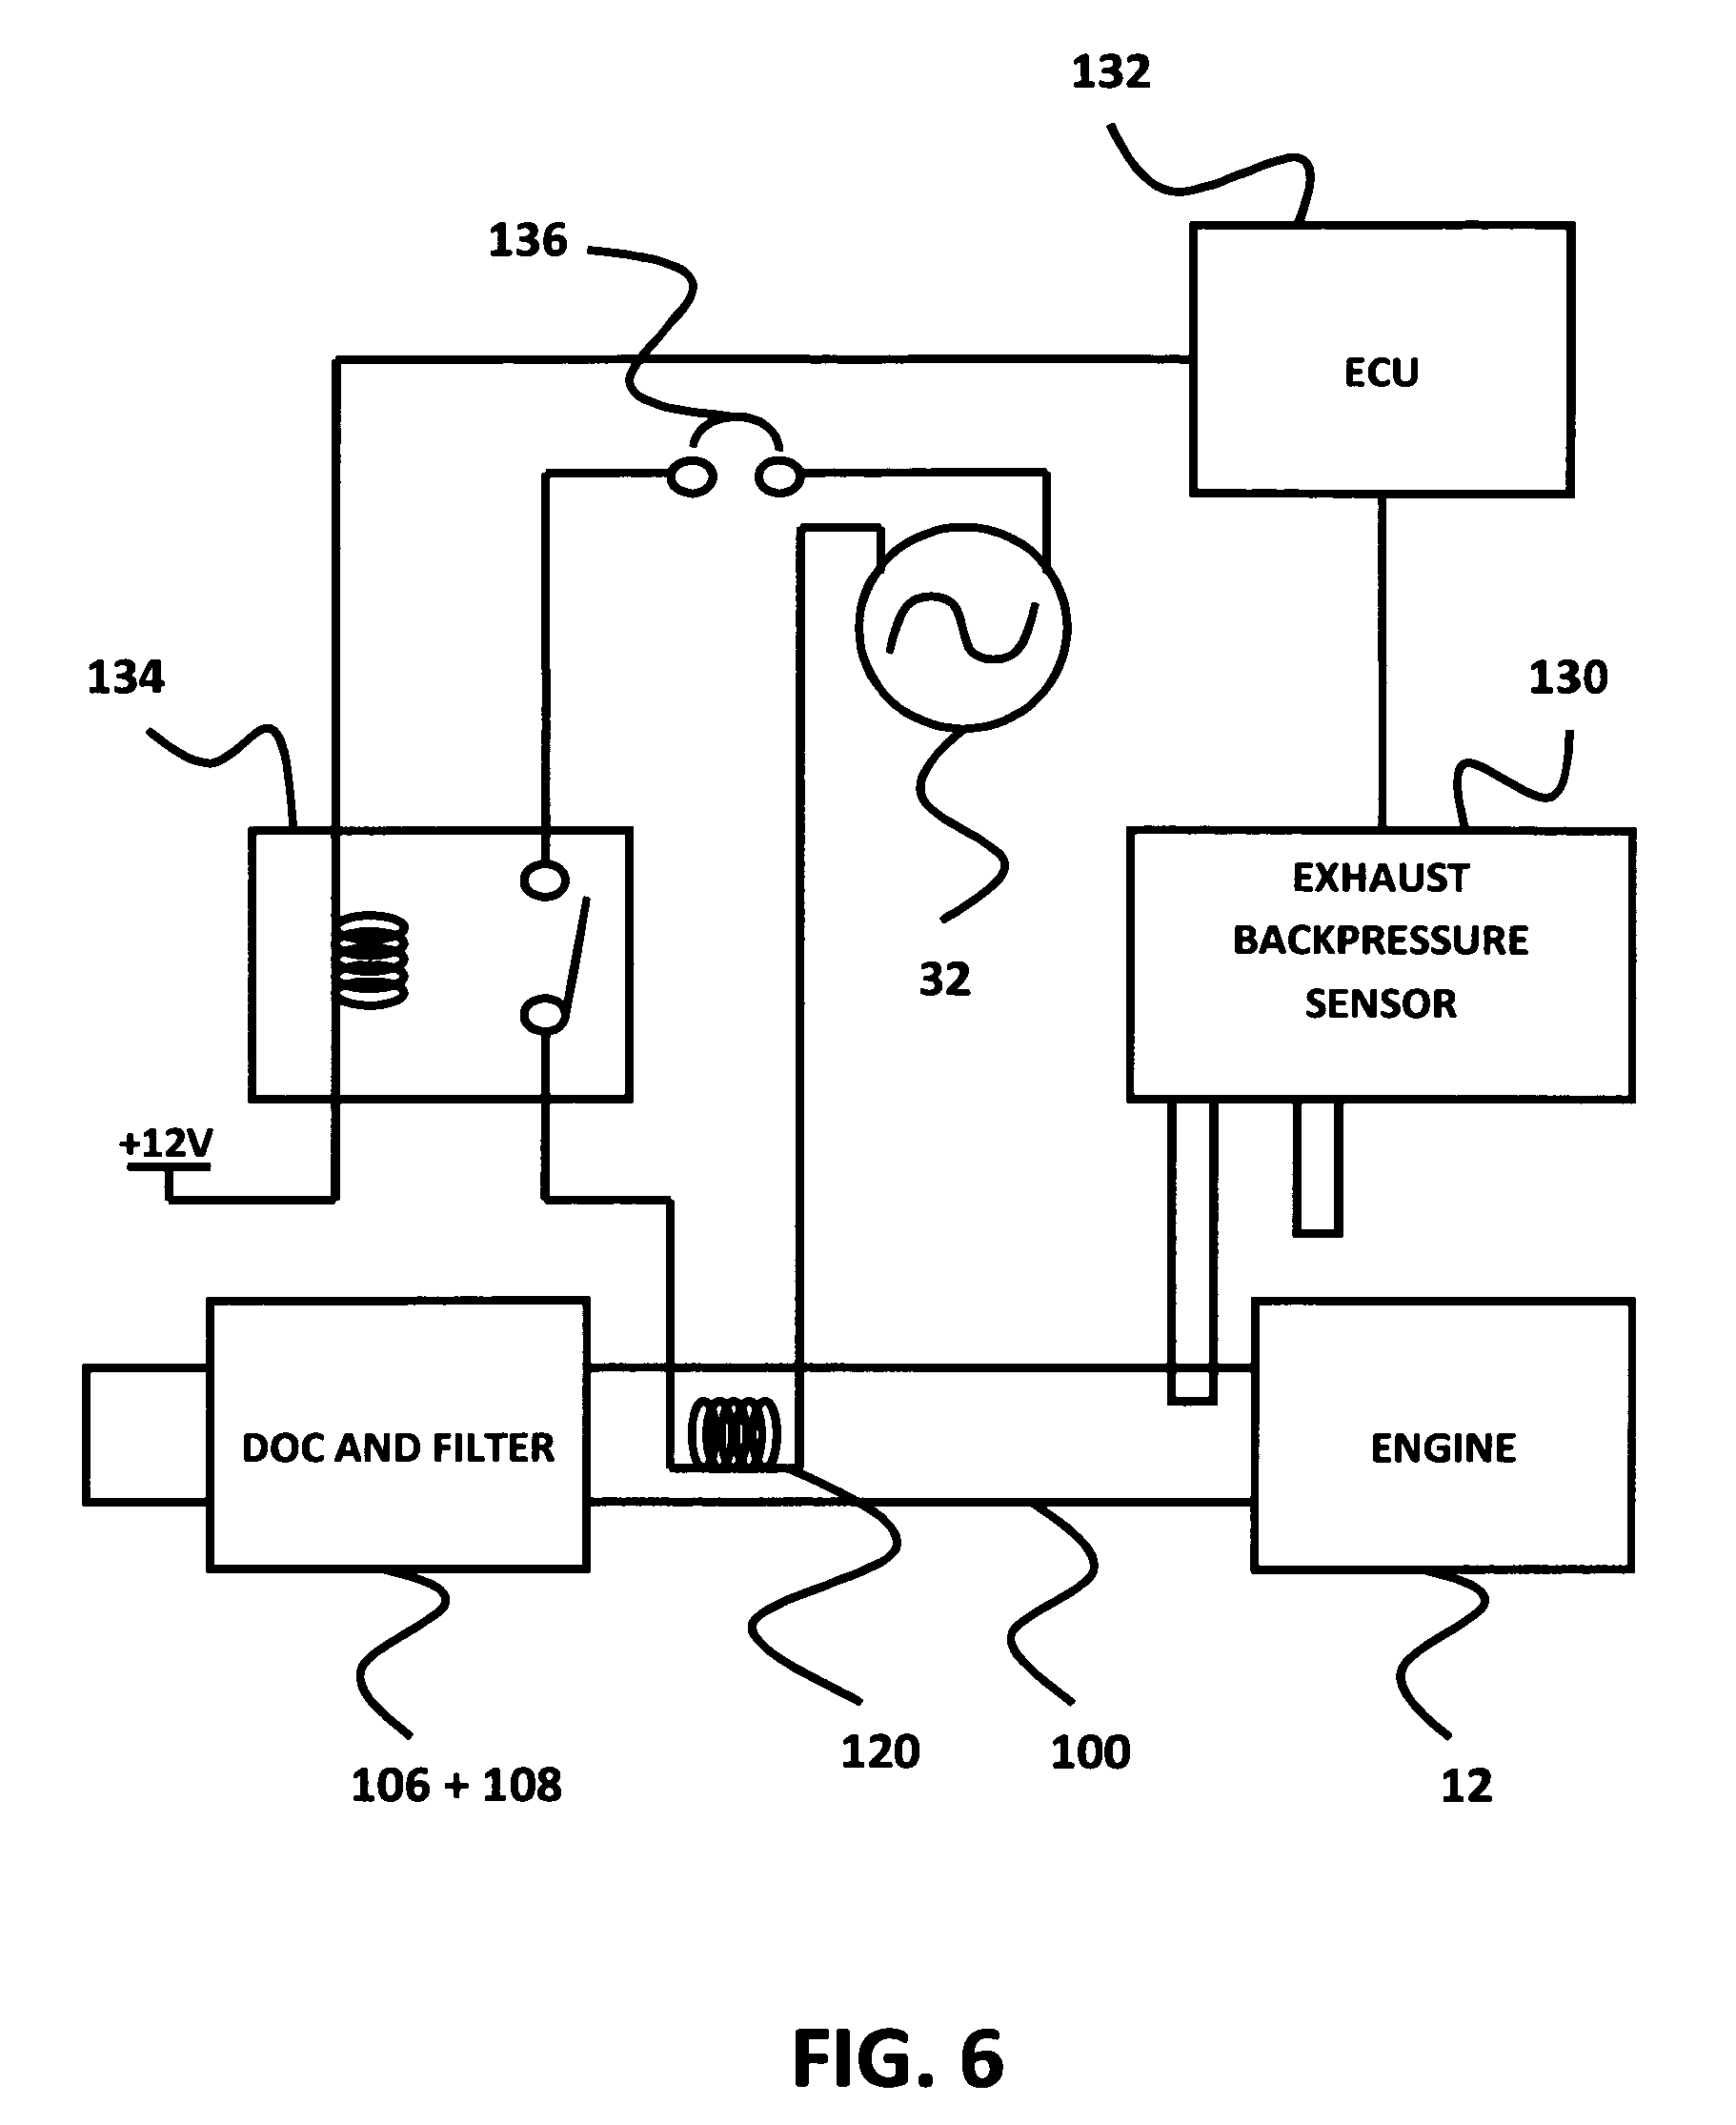 Thermo King Precedent Alternator Wiring Diagram : 47